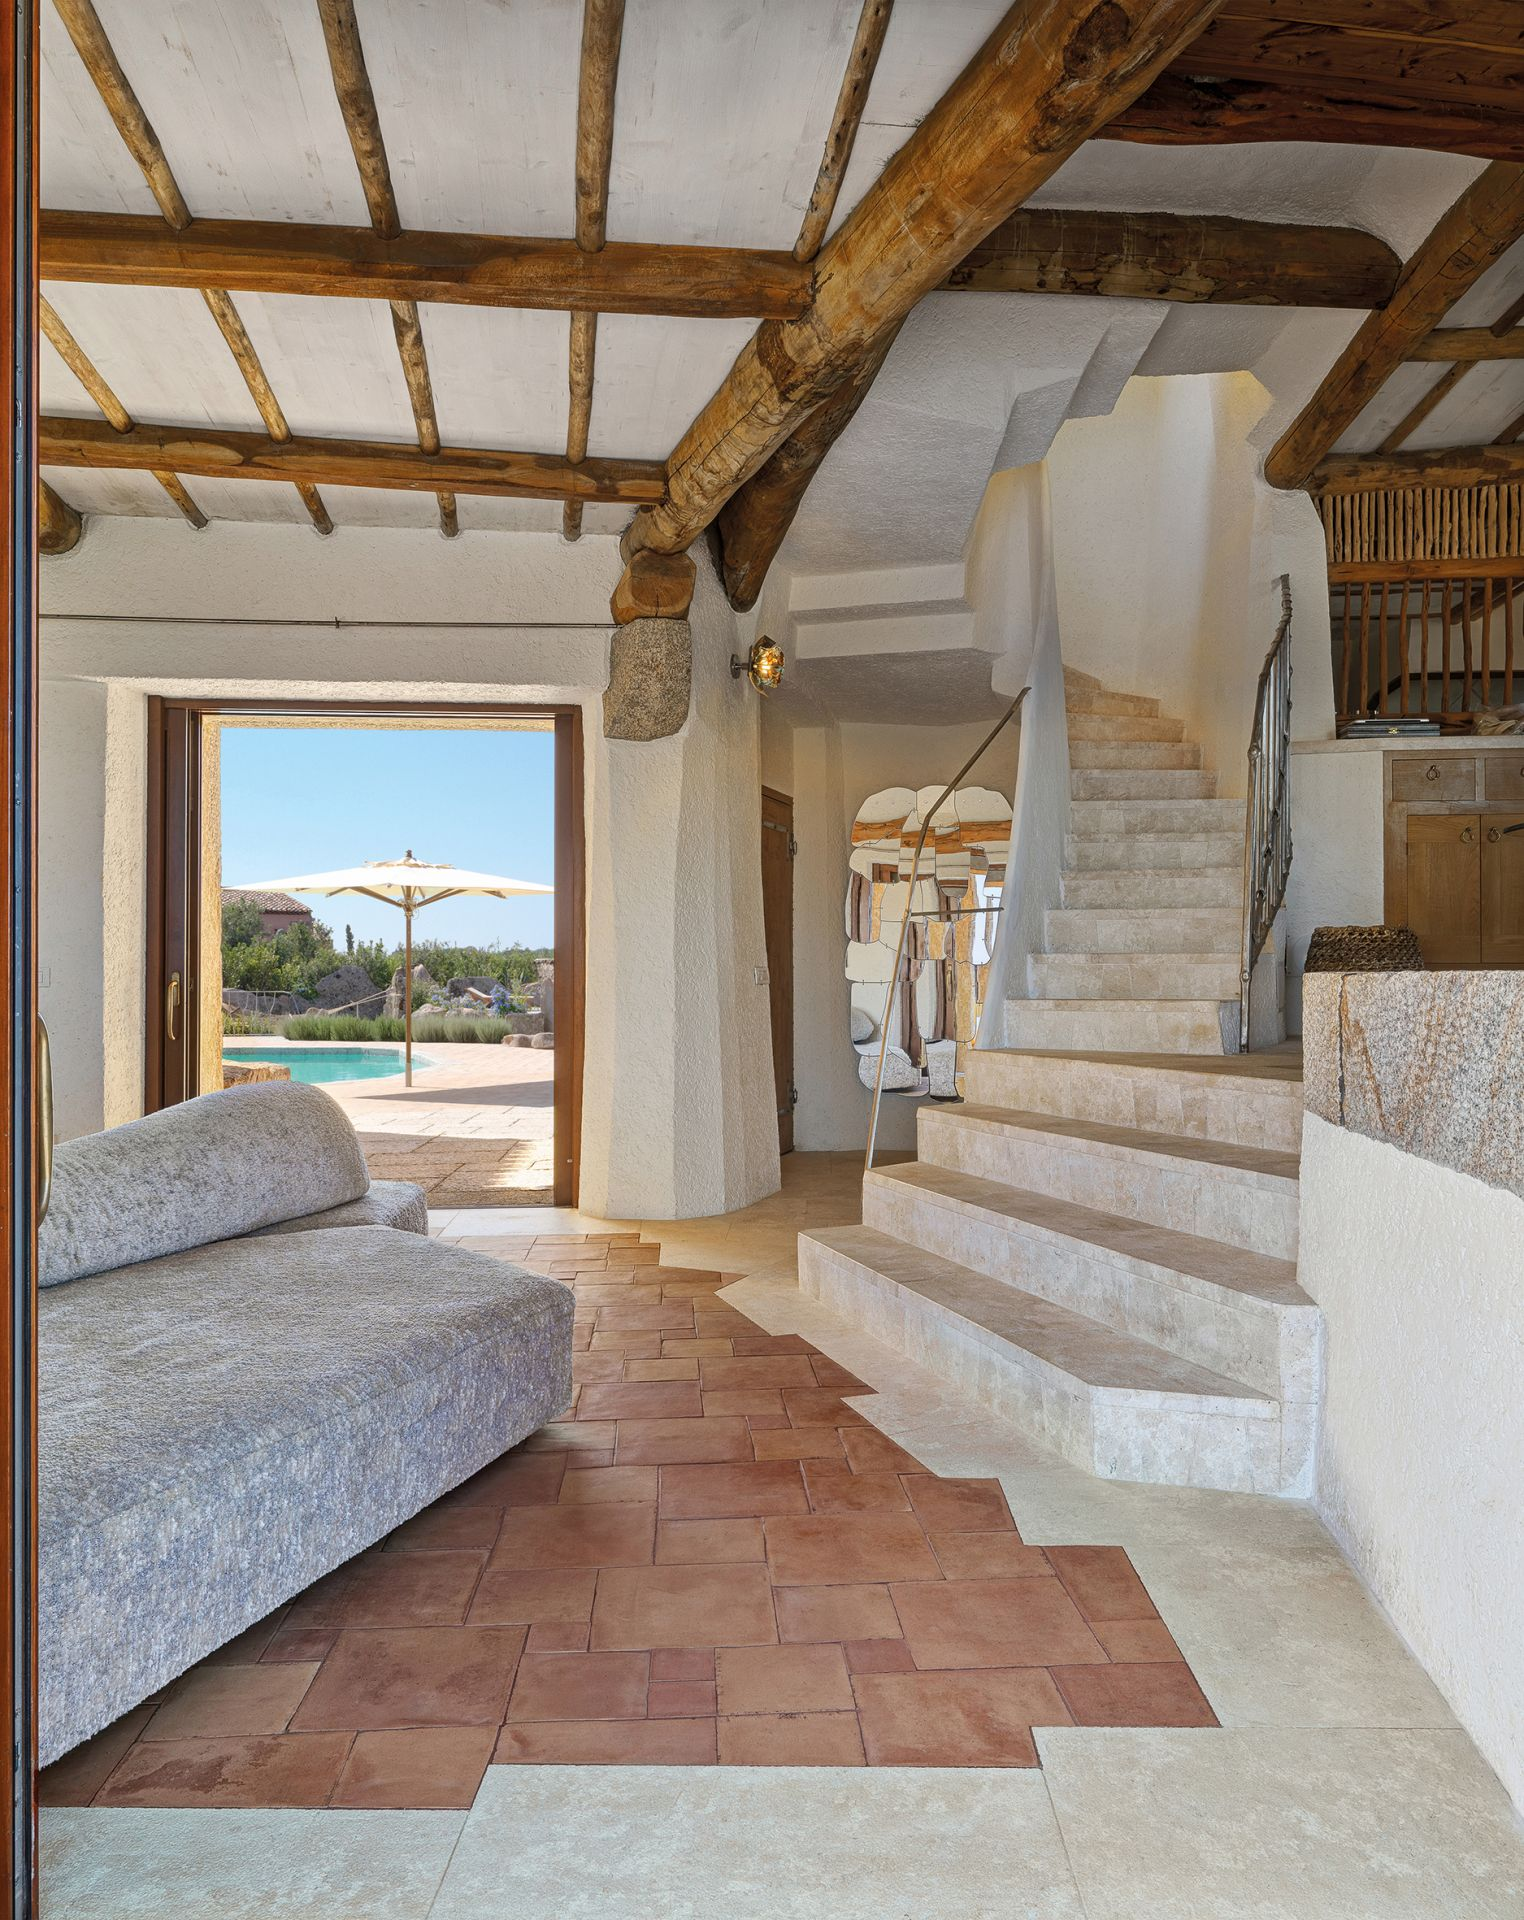 Villa in Sardegna - image 5